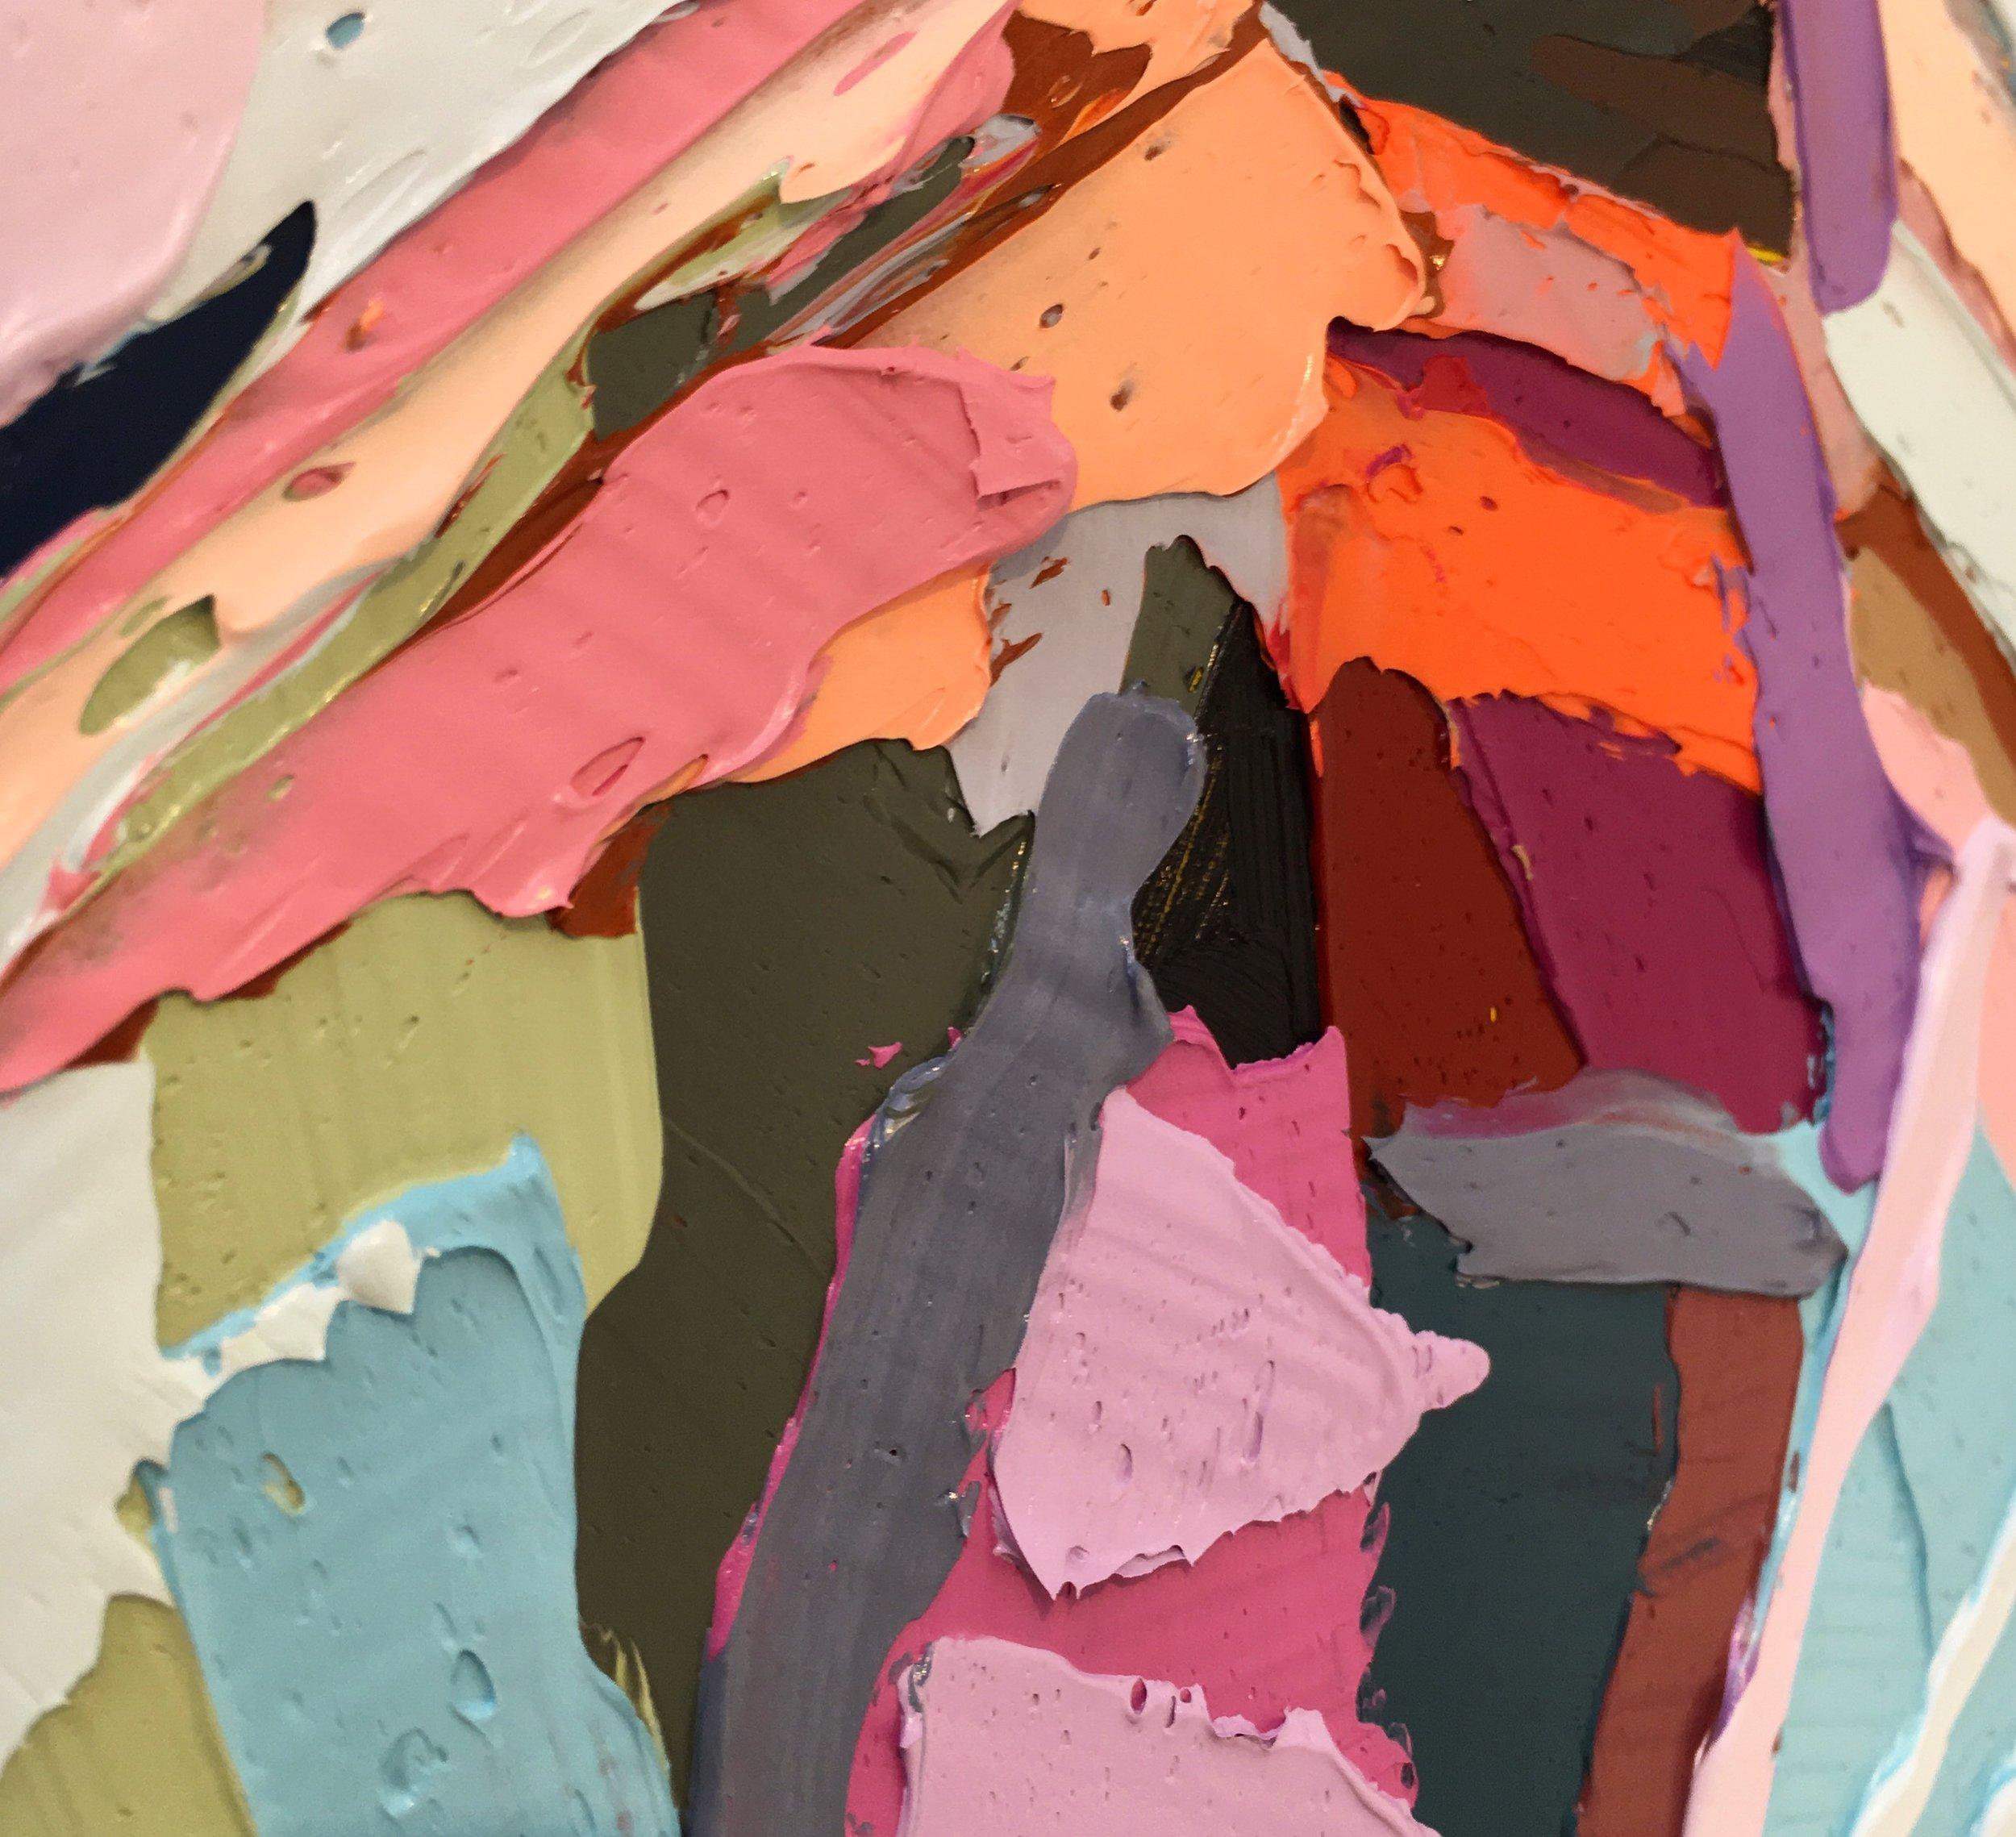 Thick Oil Paint. Kate Mullin Artist